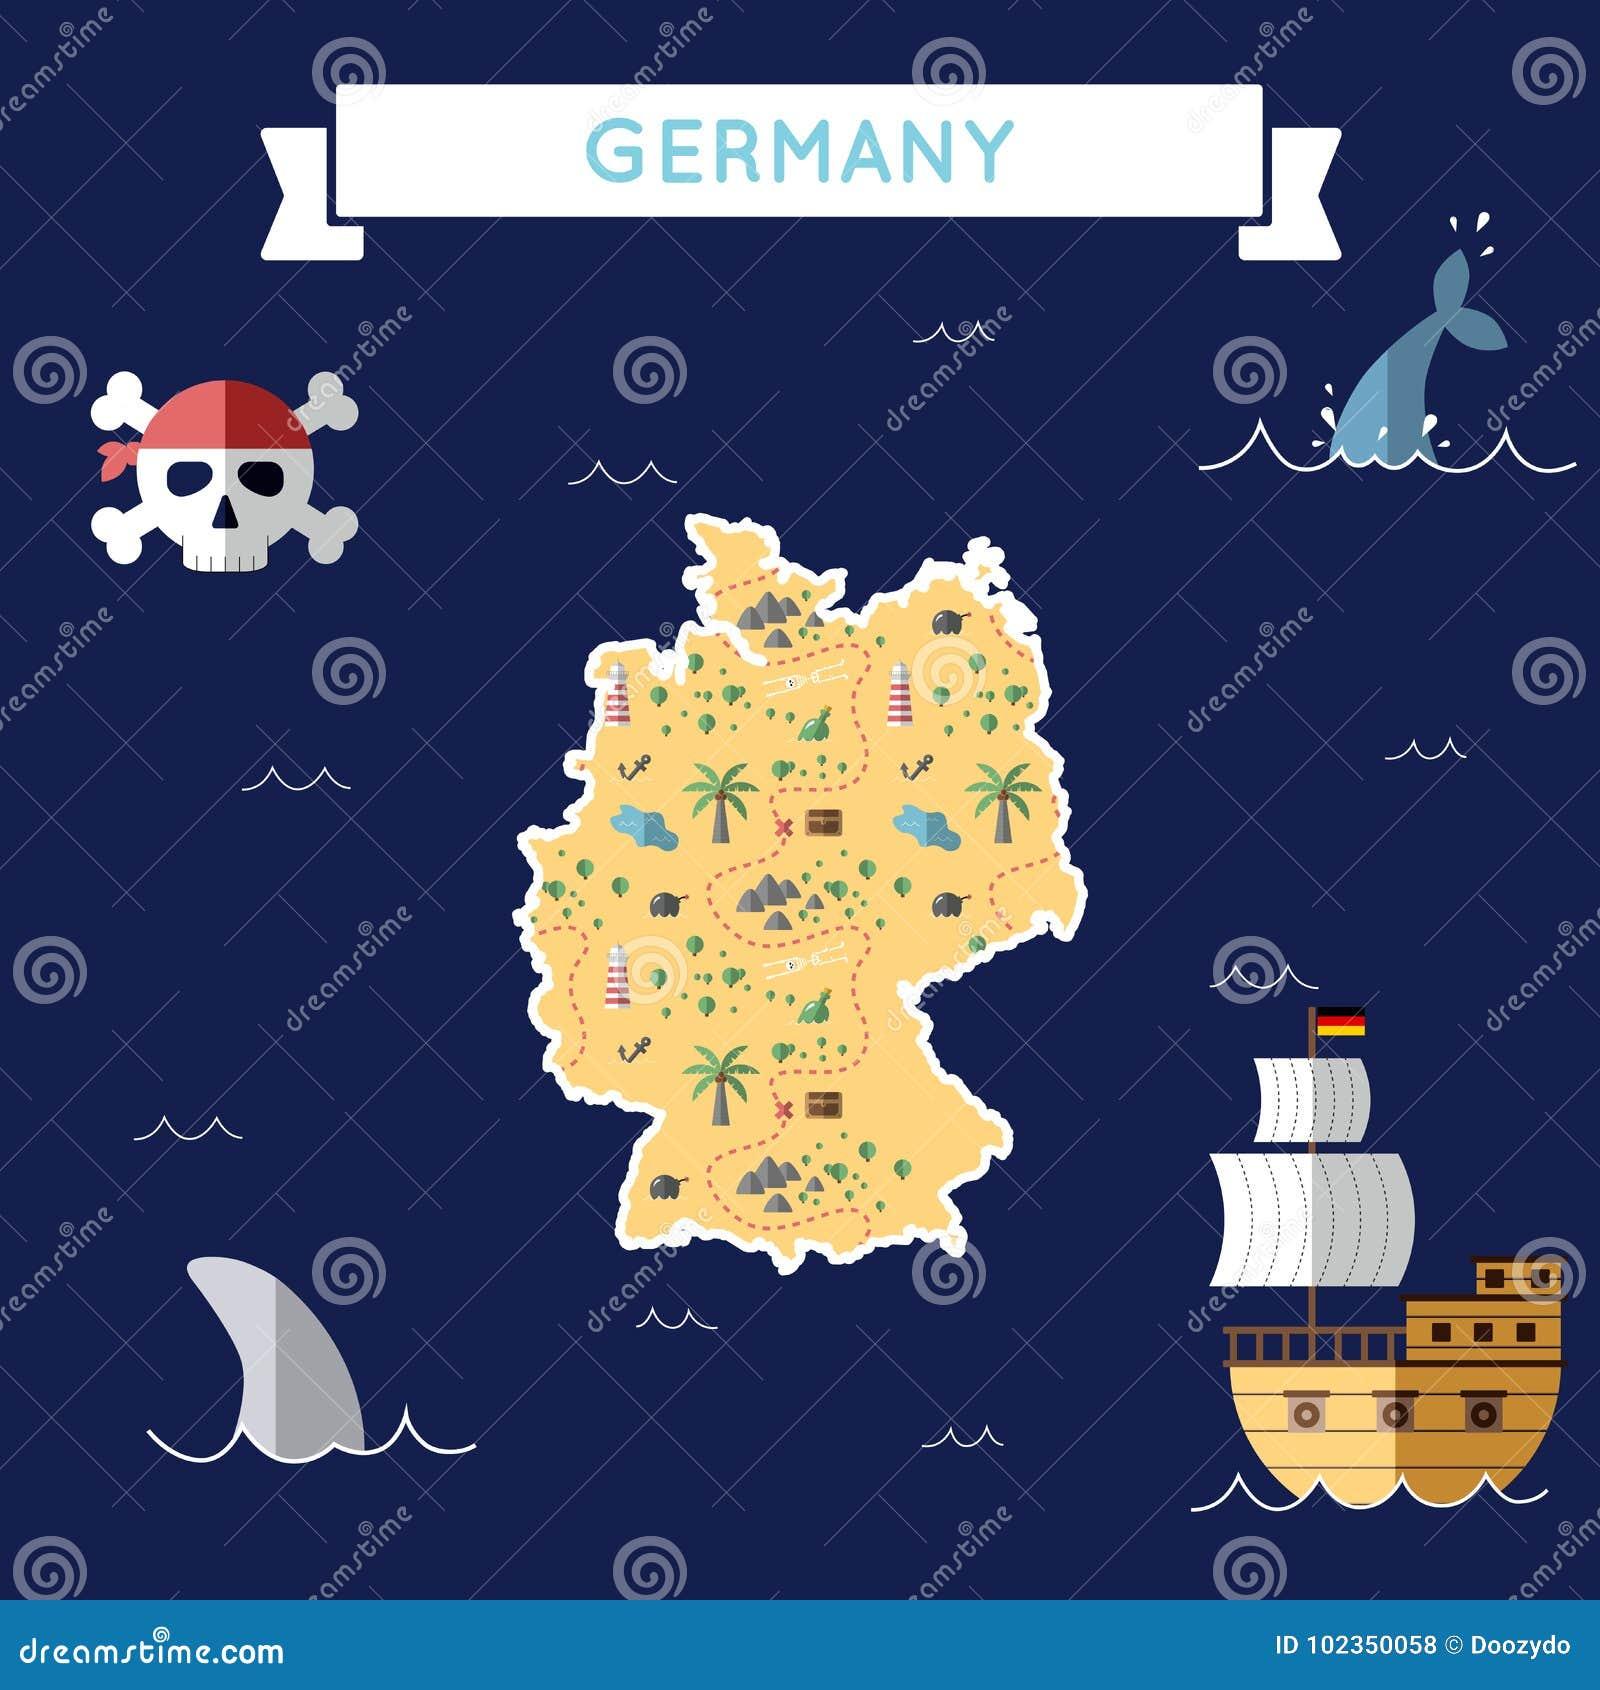 Cartoon Map Of Germany.Flat Treasure Map Of Germany Stock Vector Illustration Of Bomb